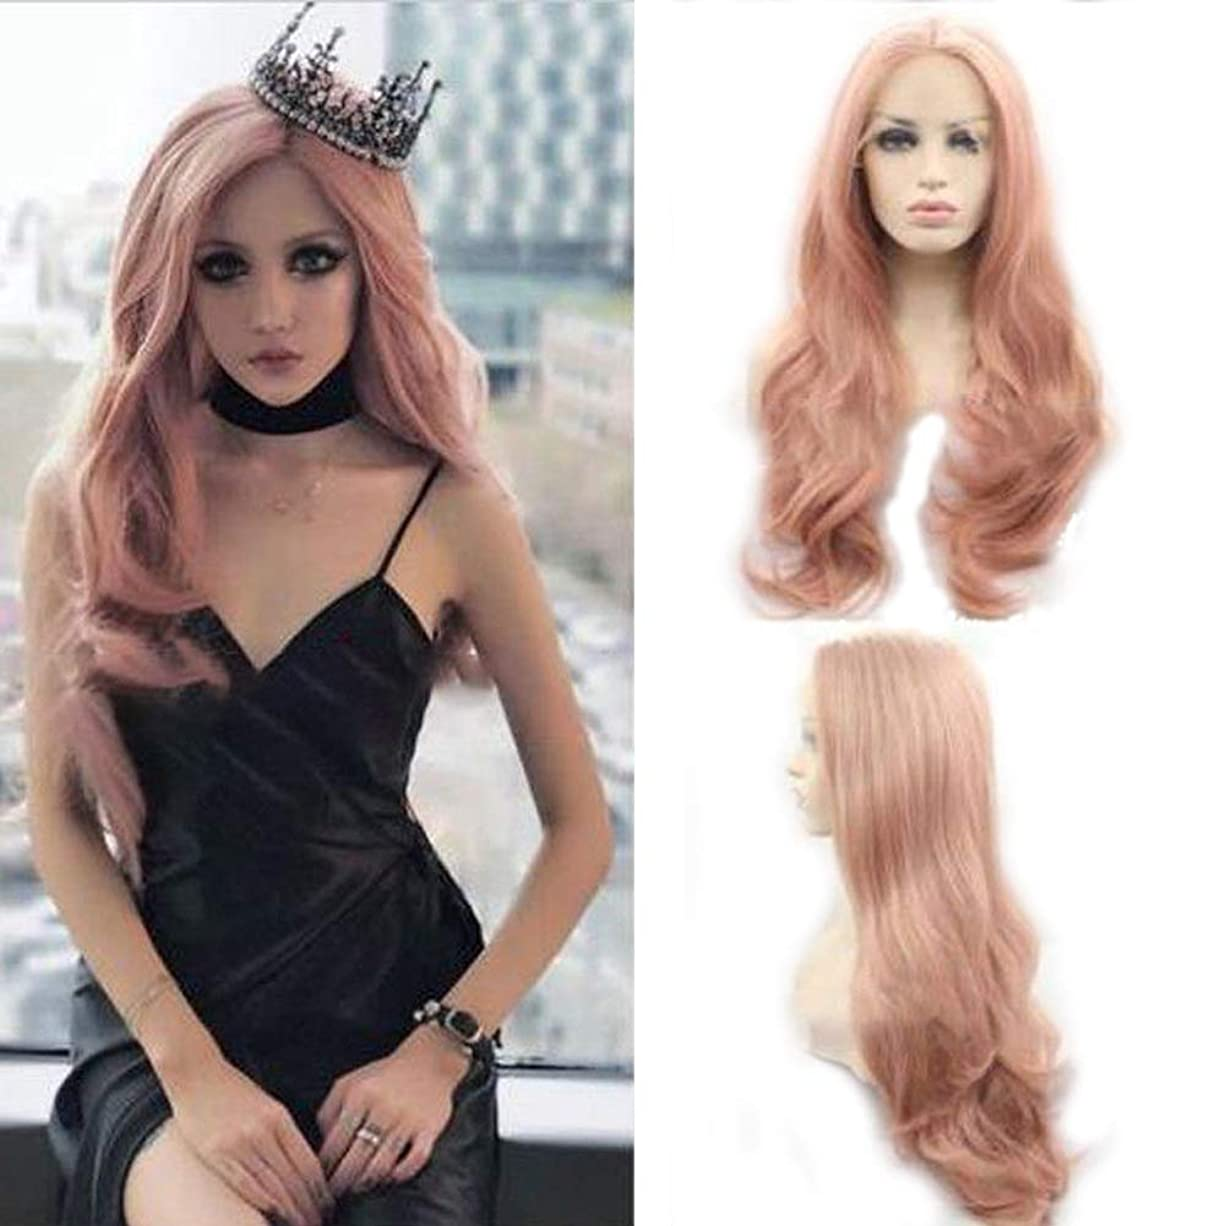 ATZWIGファッション合成レースフロントかつら長い自然な波状耐熱繊維髪かつら女性用ピンク色22インチ